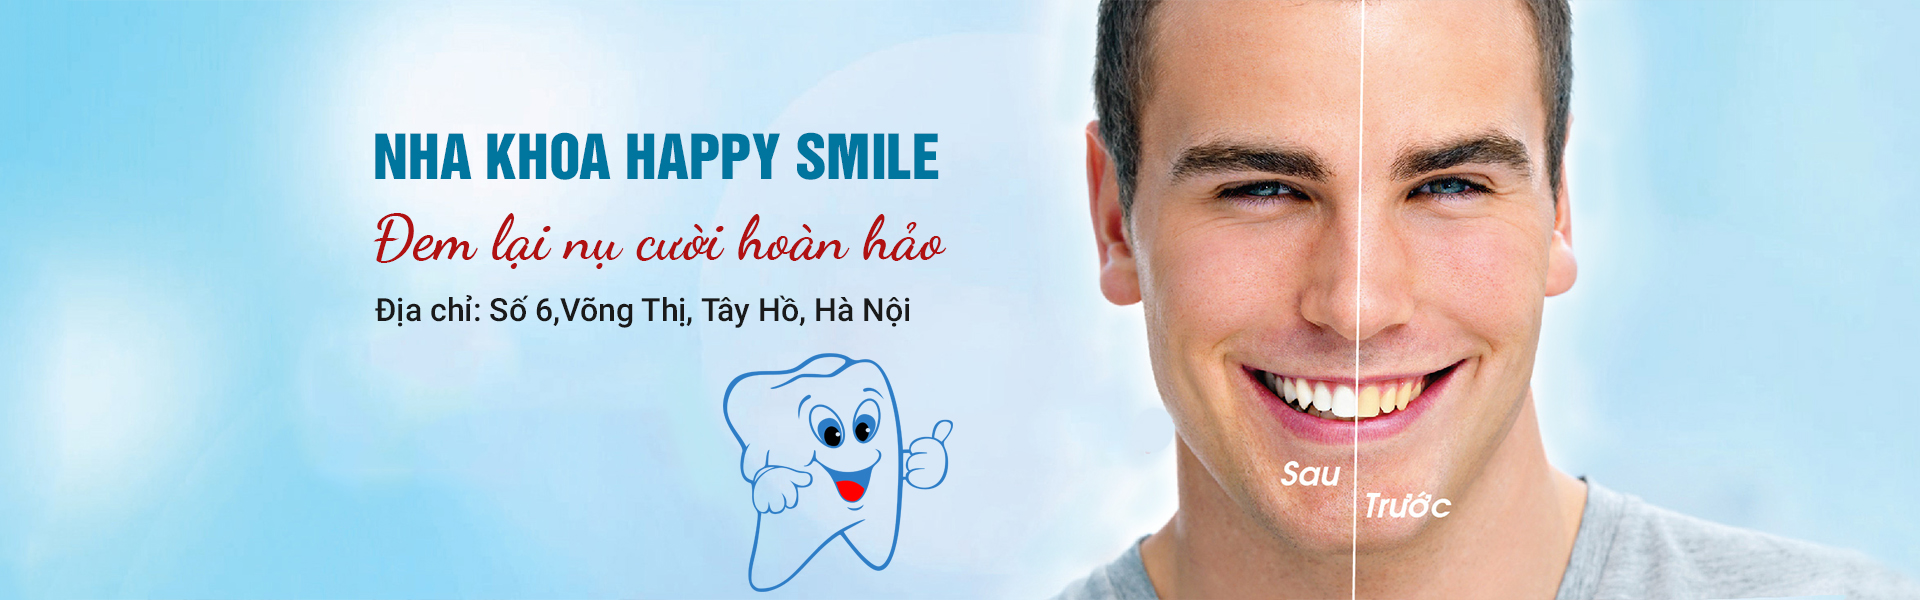 Nha Khoa Happy Smile - Cơ sở 2